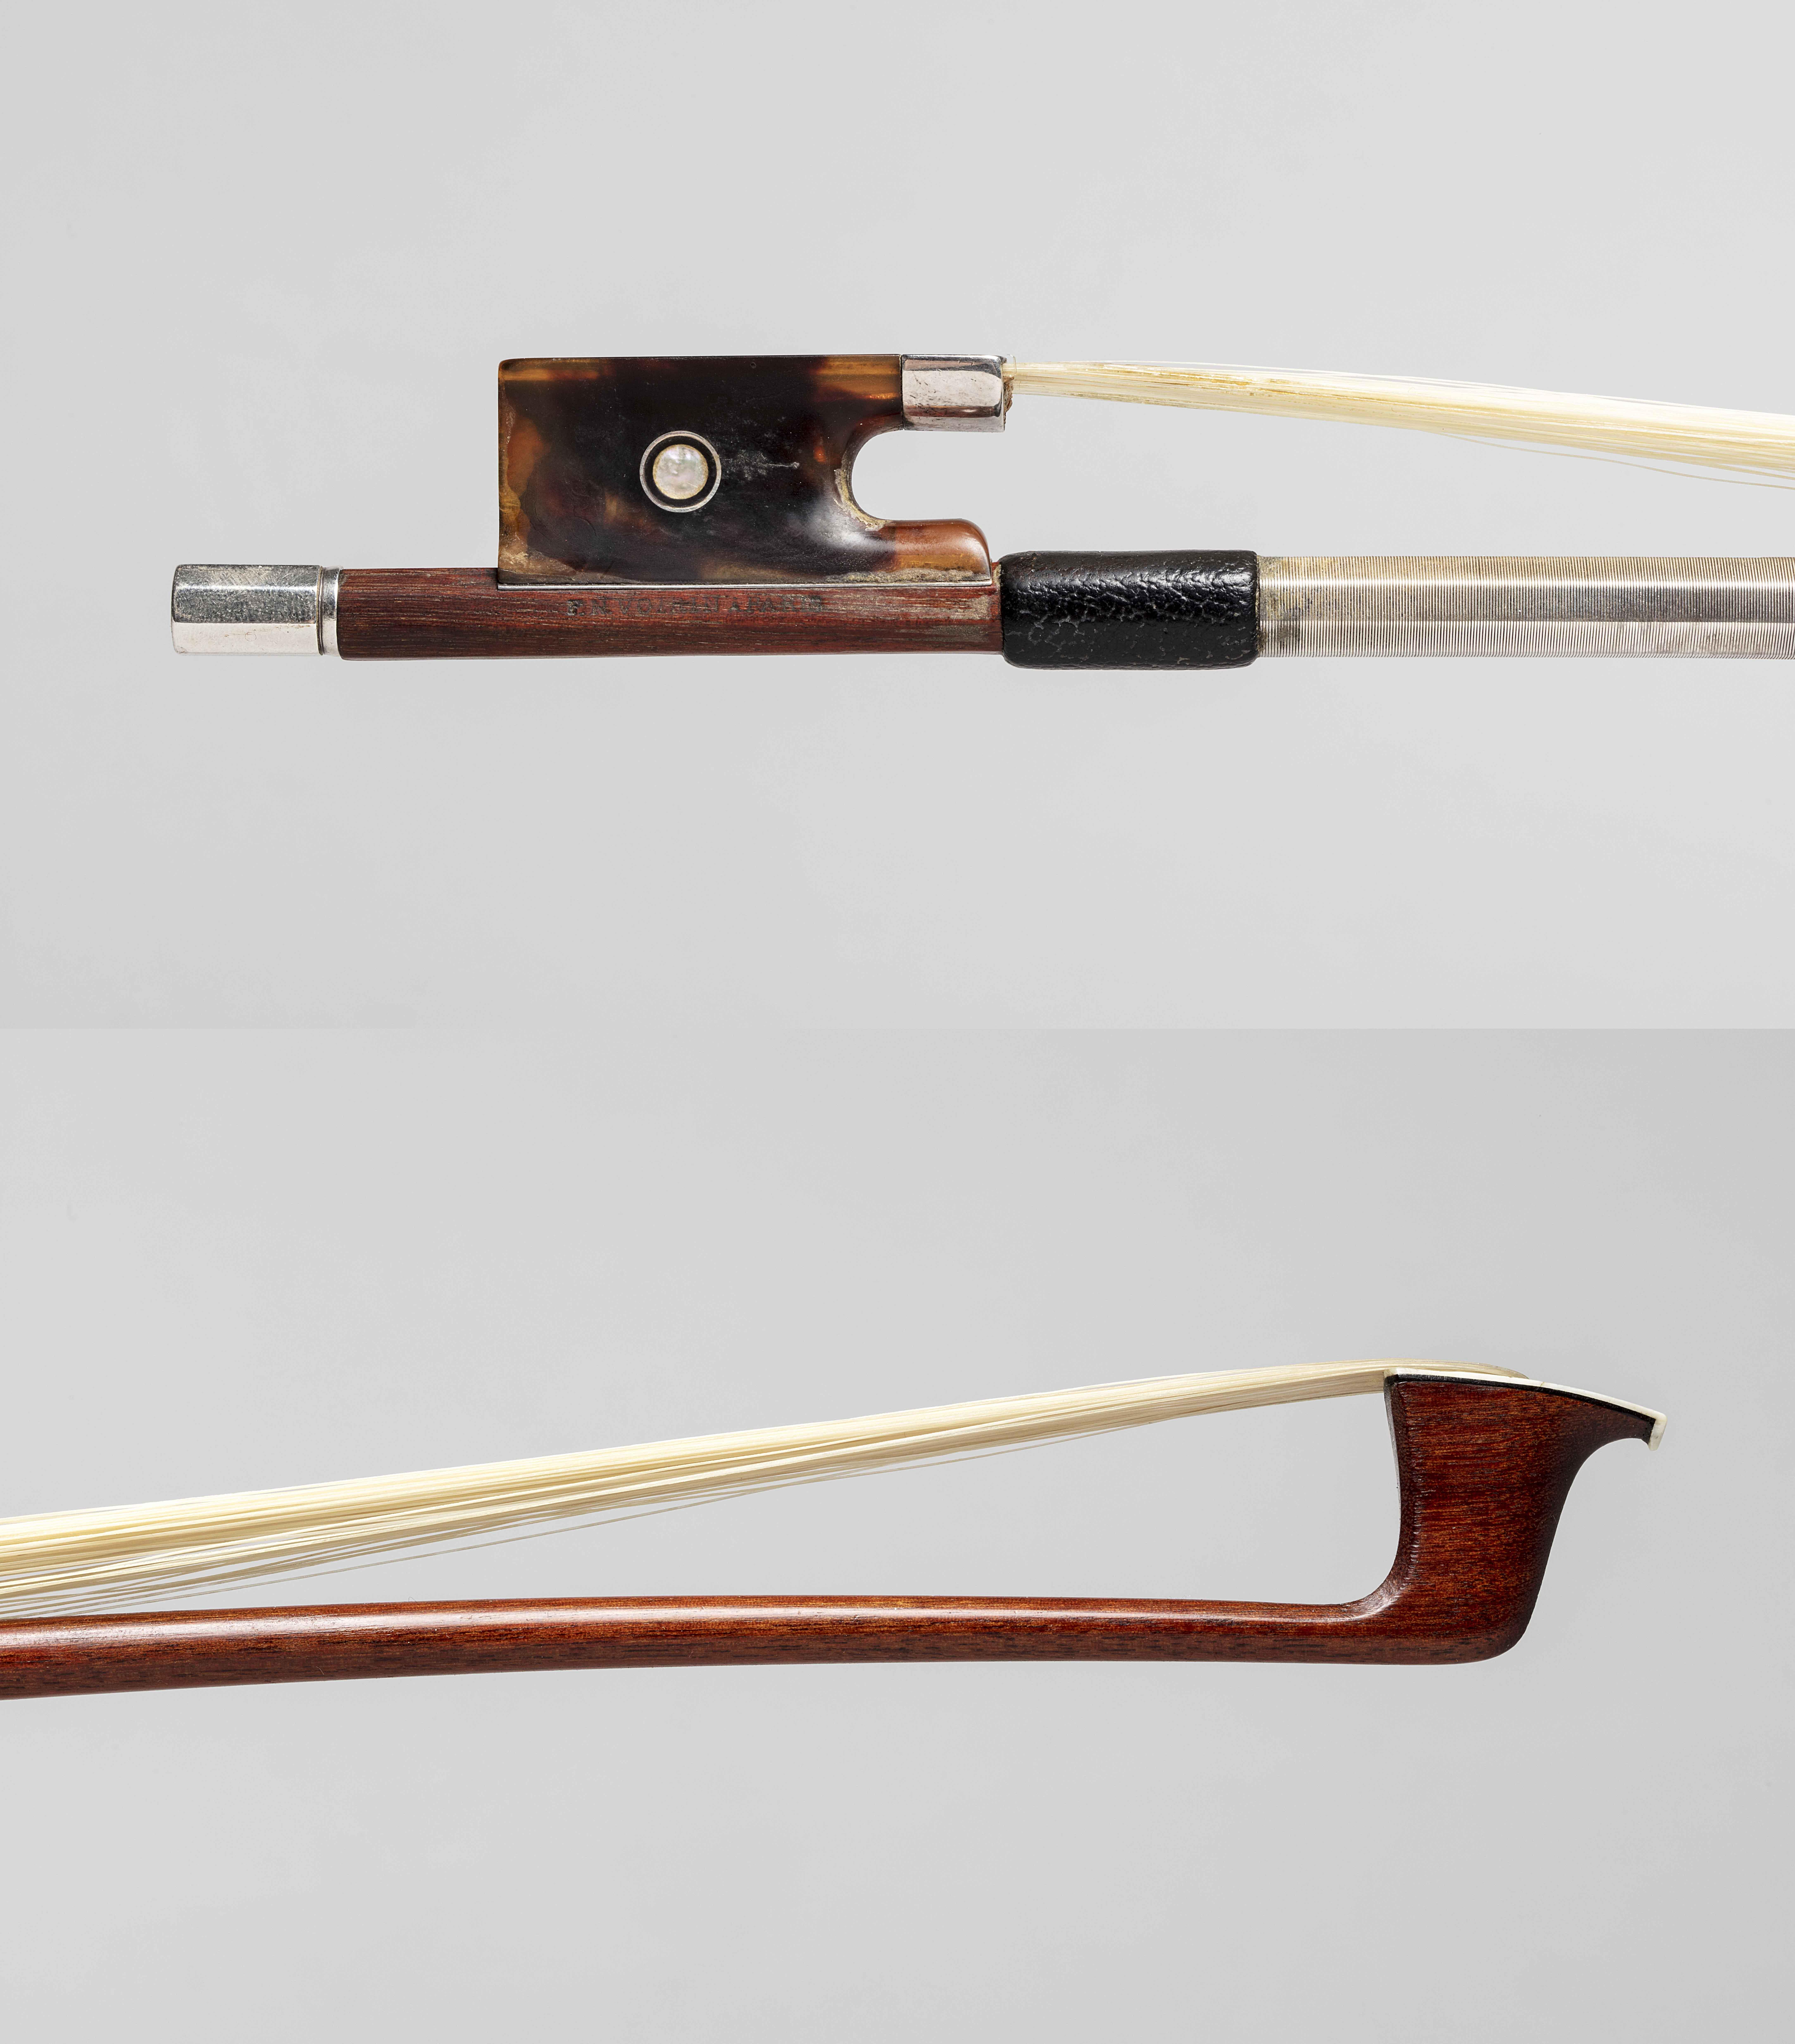 Archet de violon FN Voirin, image ©Rossini